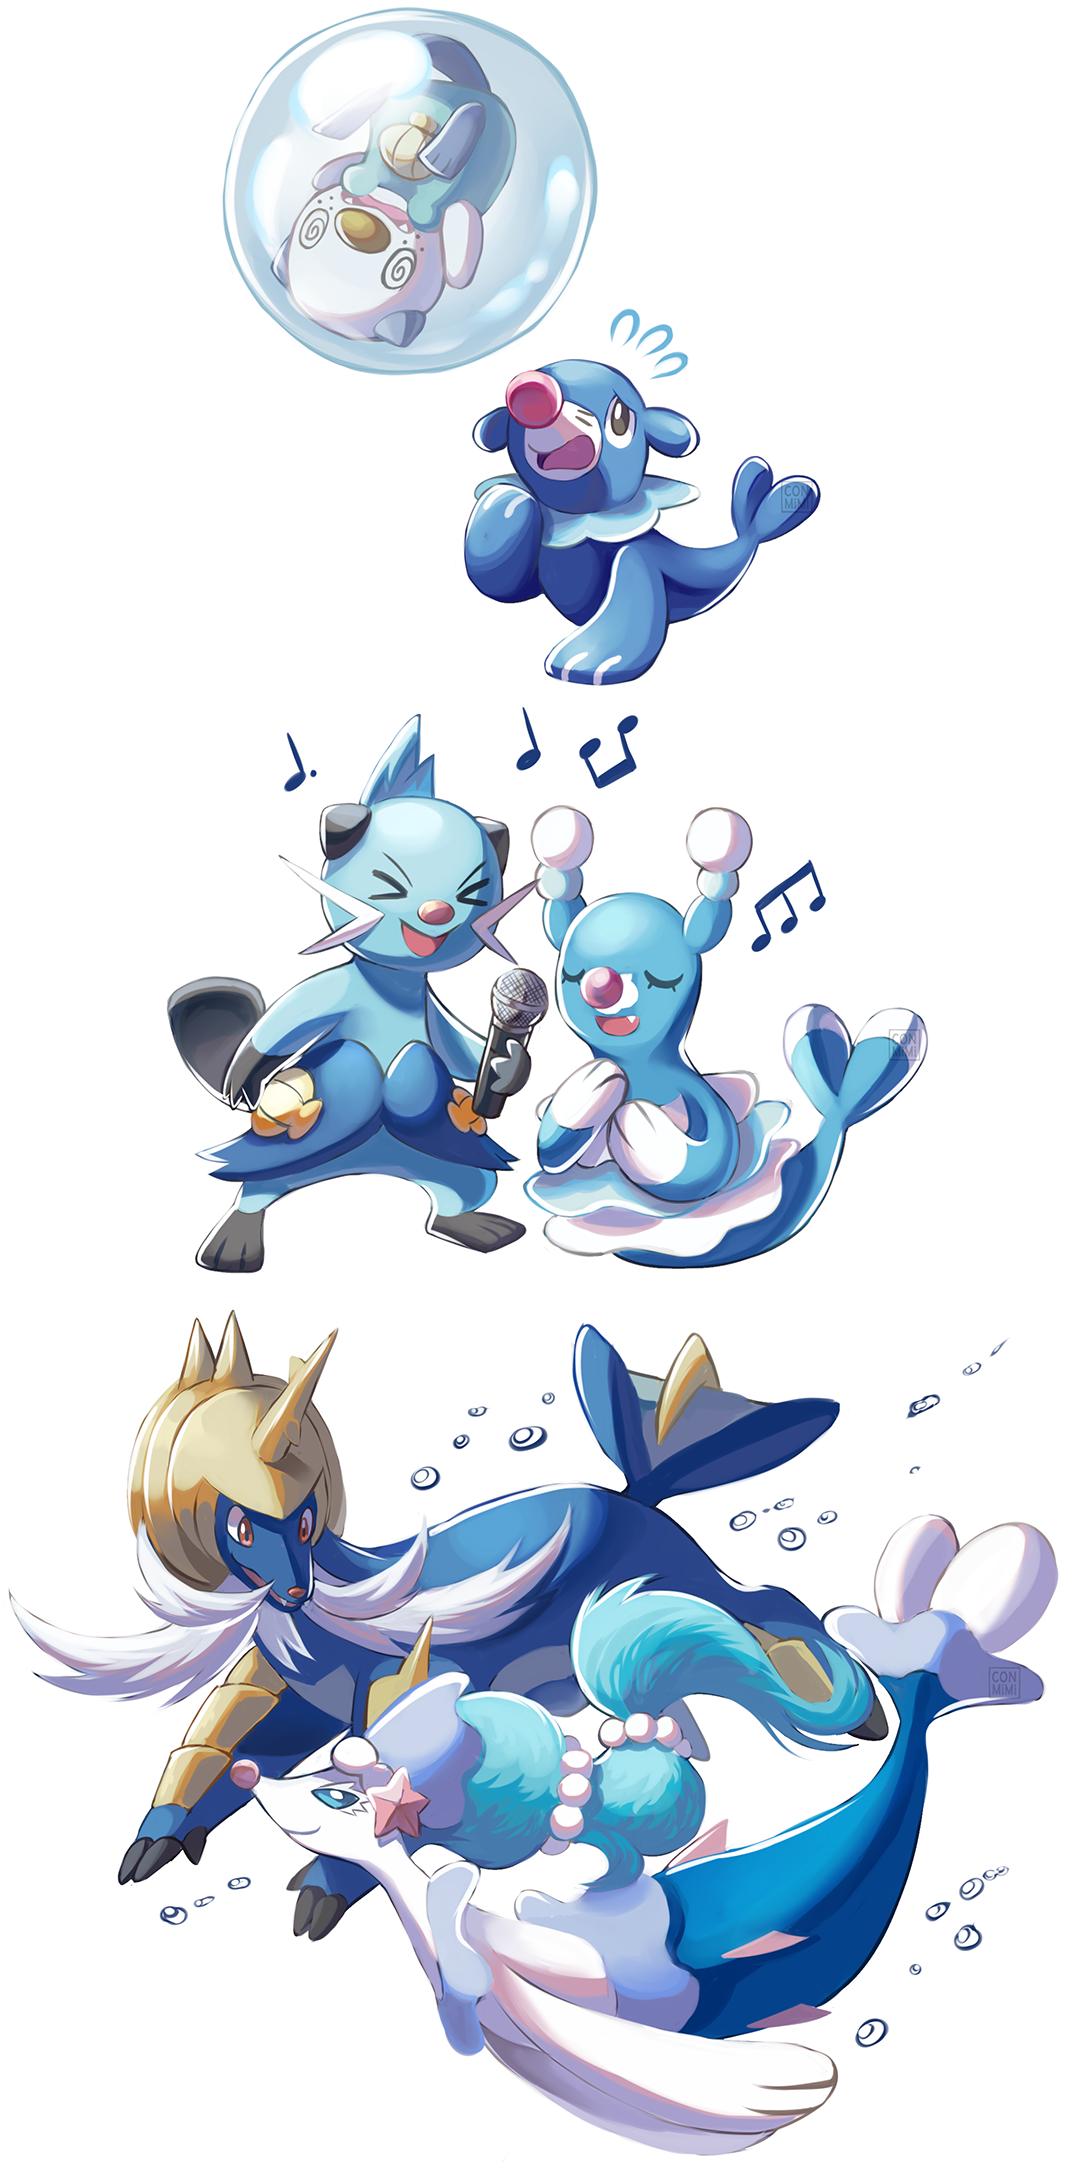 Samurott – Pokémon   page 4 of 5 – Zerochan Anime Image Board